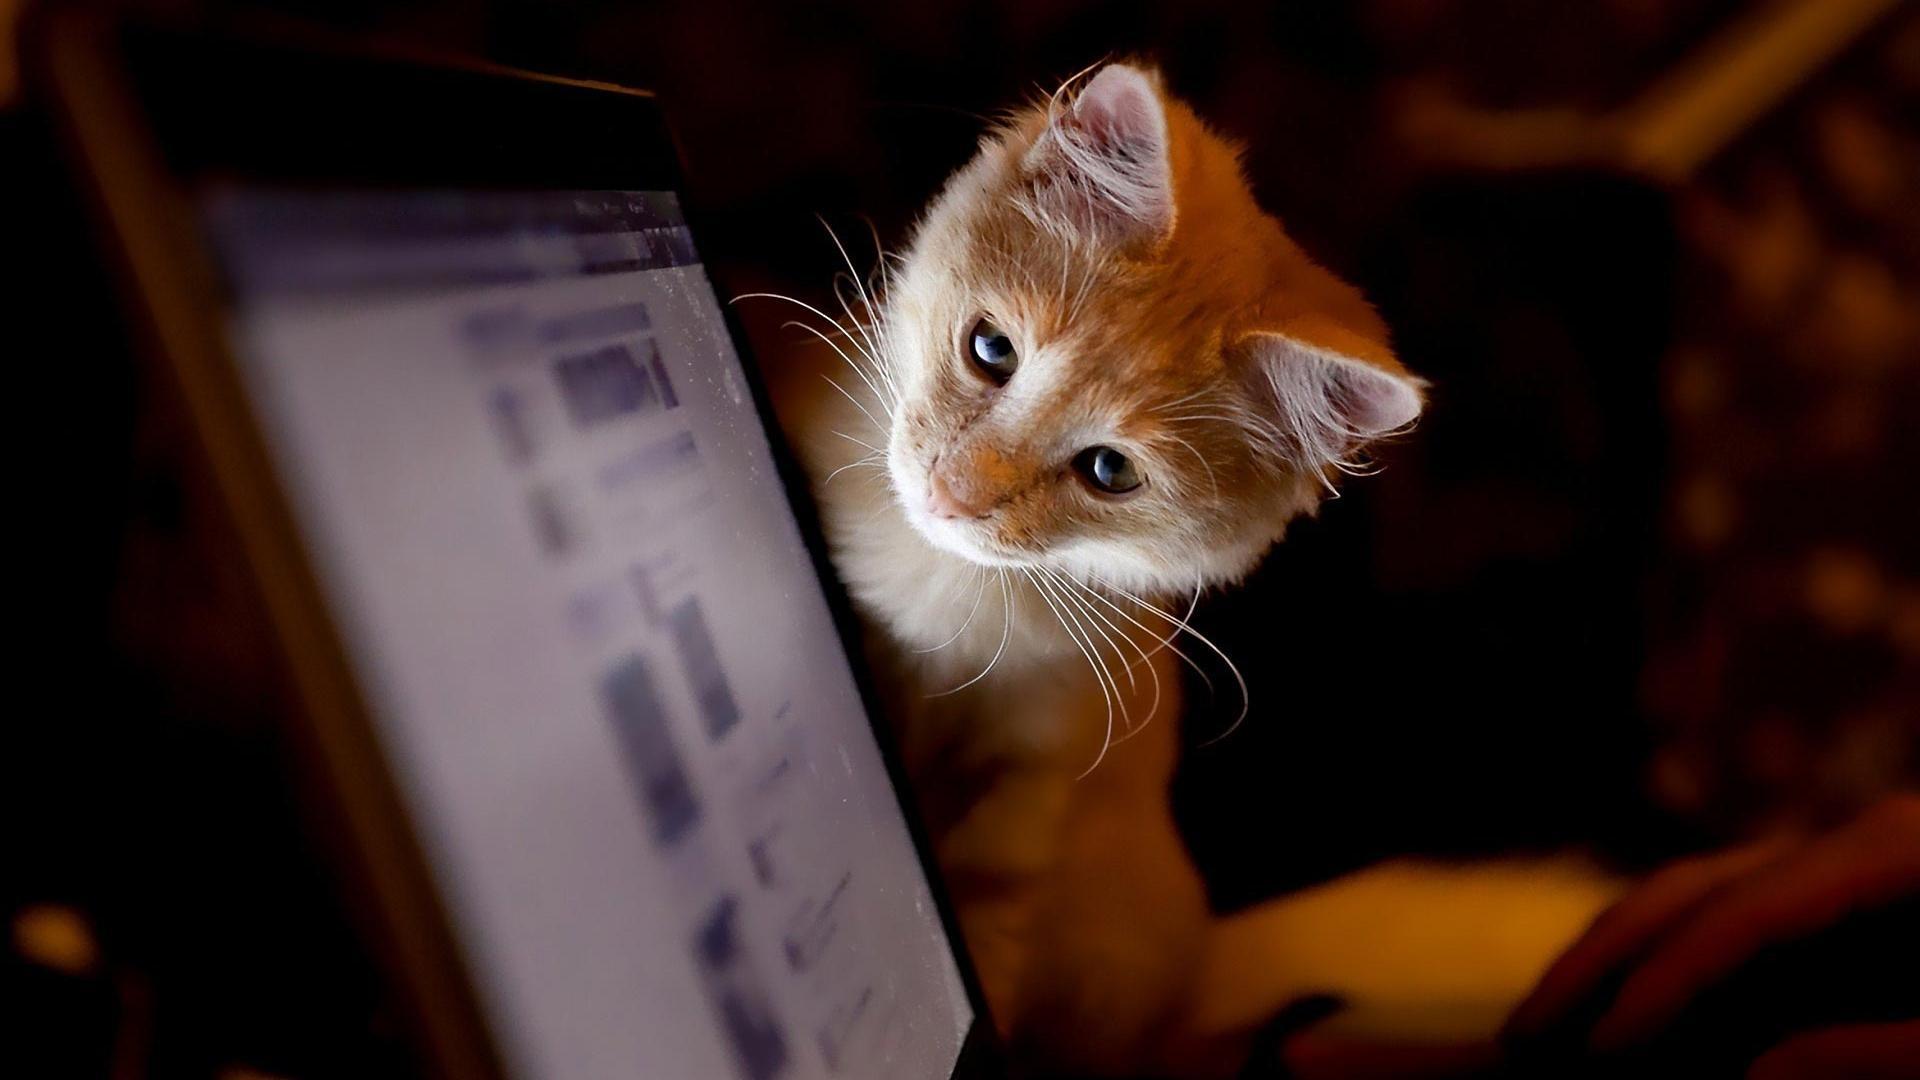 cat-kitty-computer-screen-animal-1920x1080